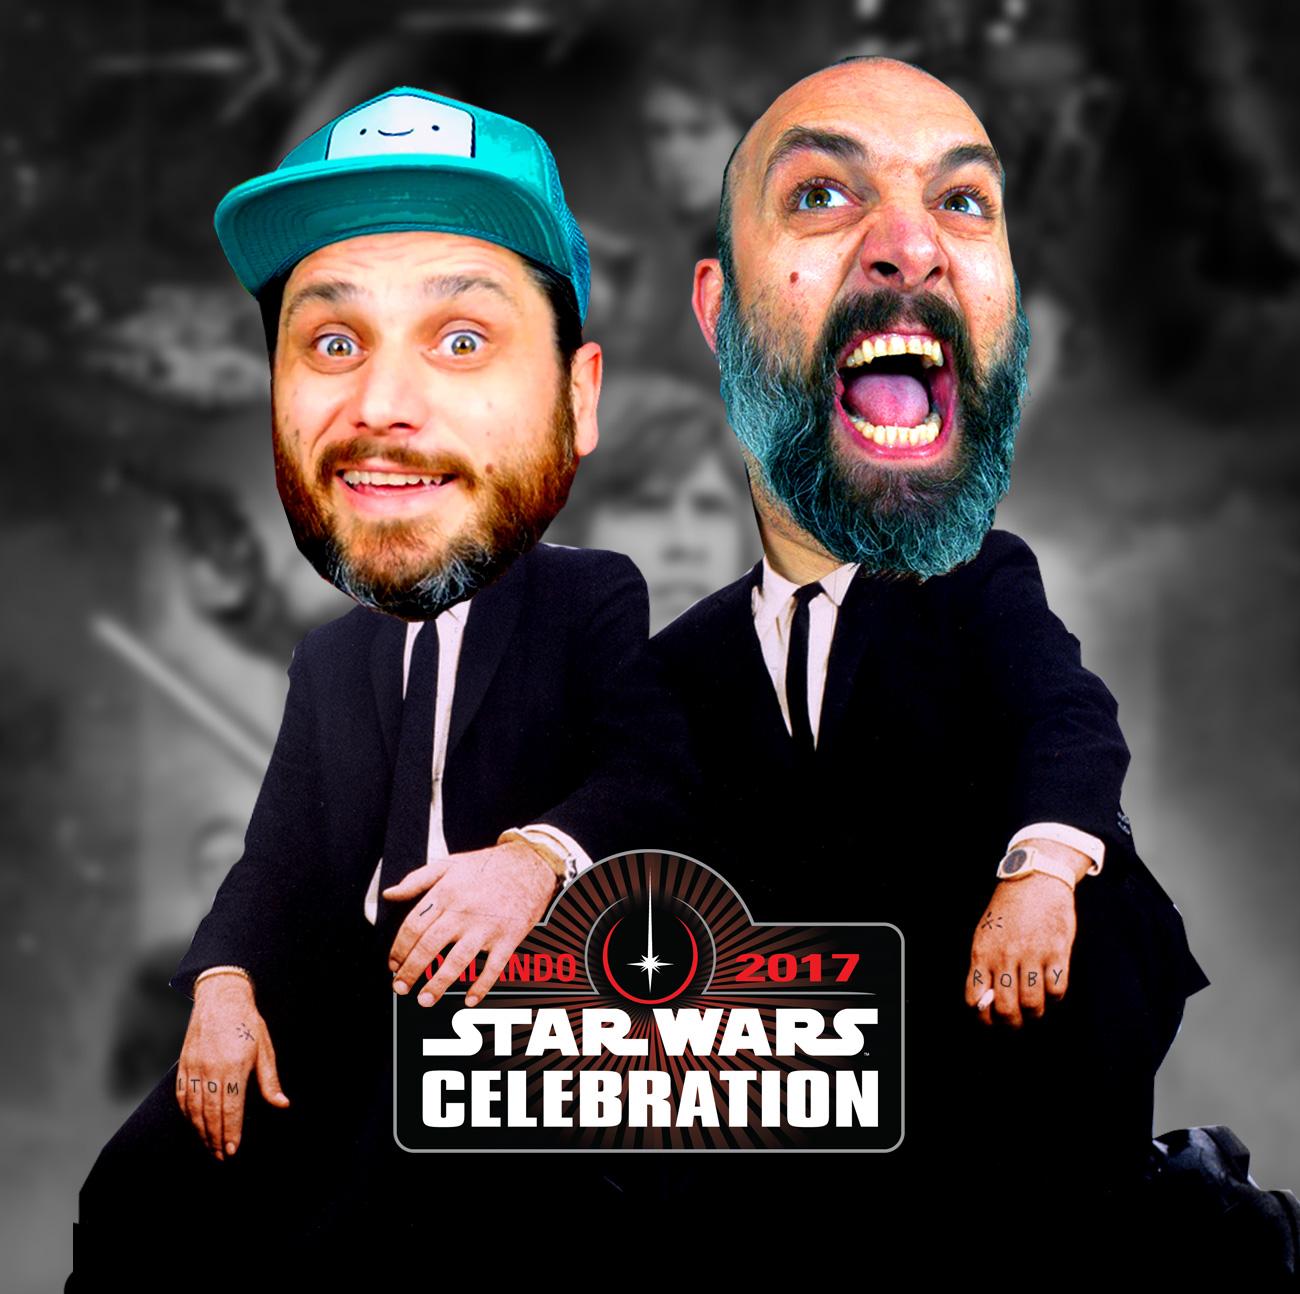 Lega Nerd goes to Star Wars Celebration 2017!